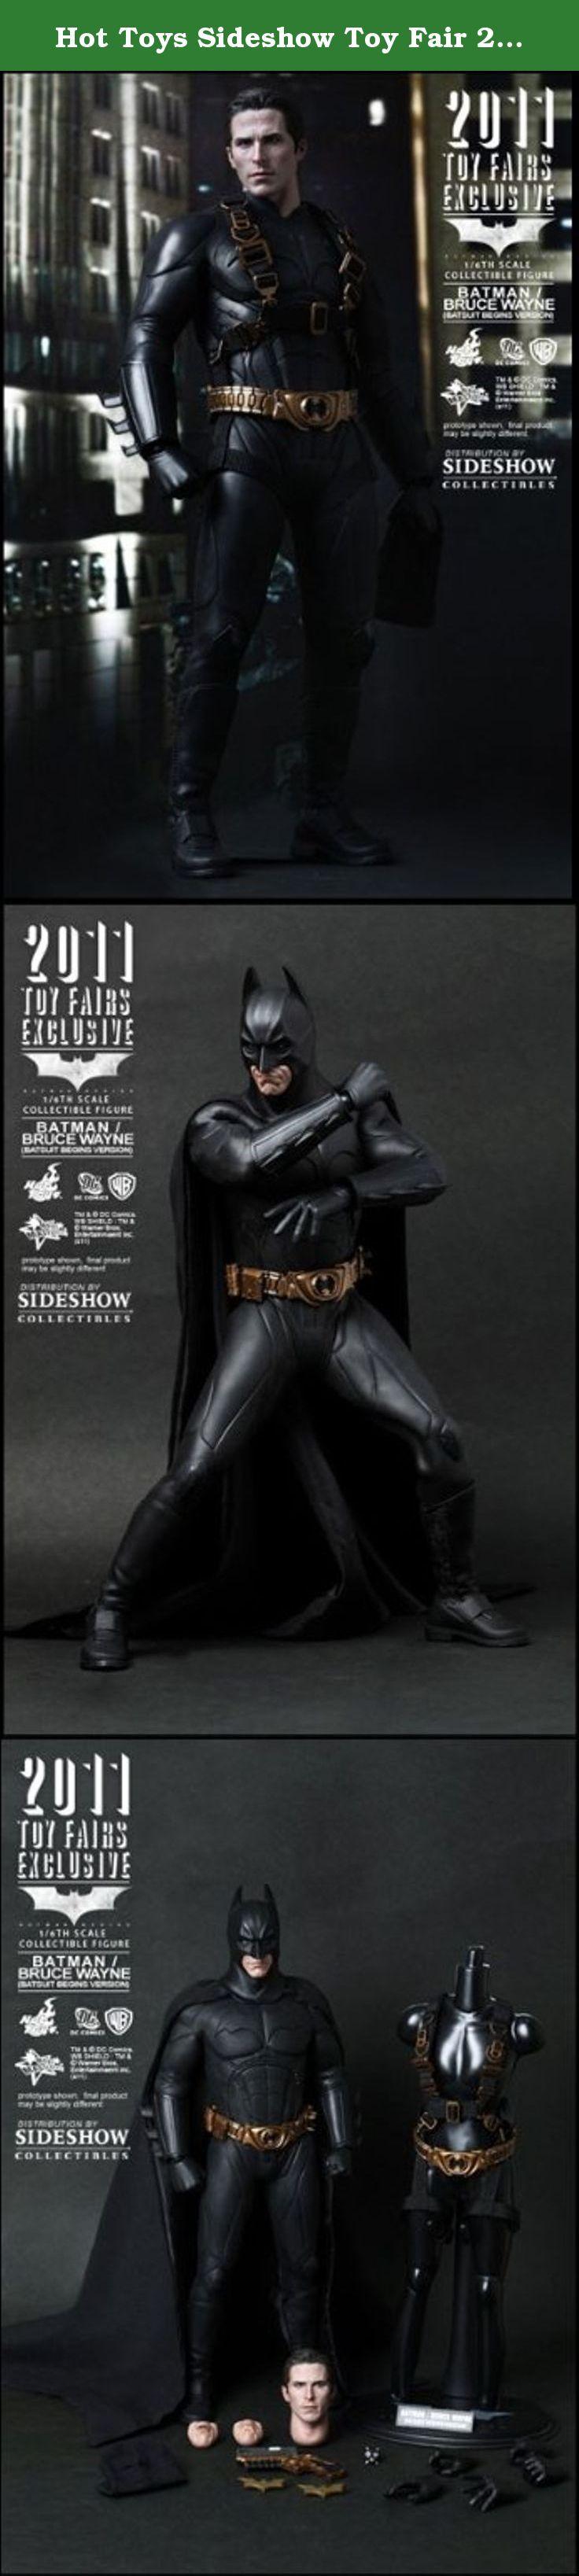 Hot Toys Sideshow Toy Fair 2011 Batman Begins Bruce Wayne Batsuit. Hot Toys Sideshow Toyfair 2011 Batman Begins Bruce Wayne Batsuit new in box!.